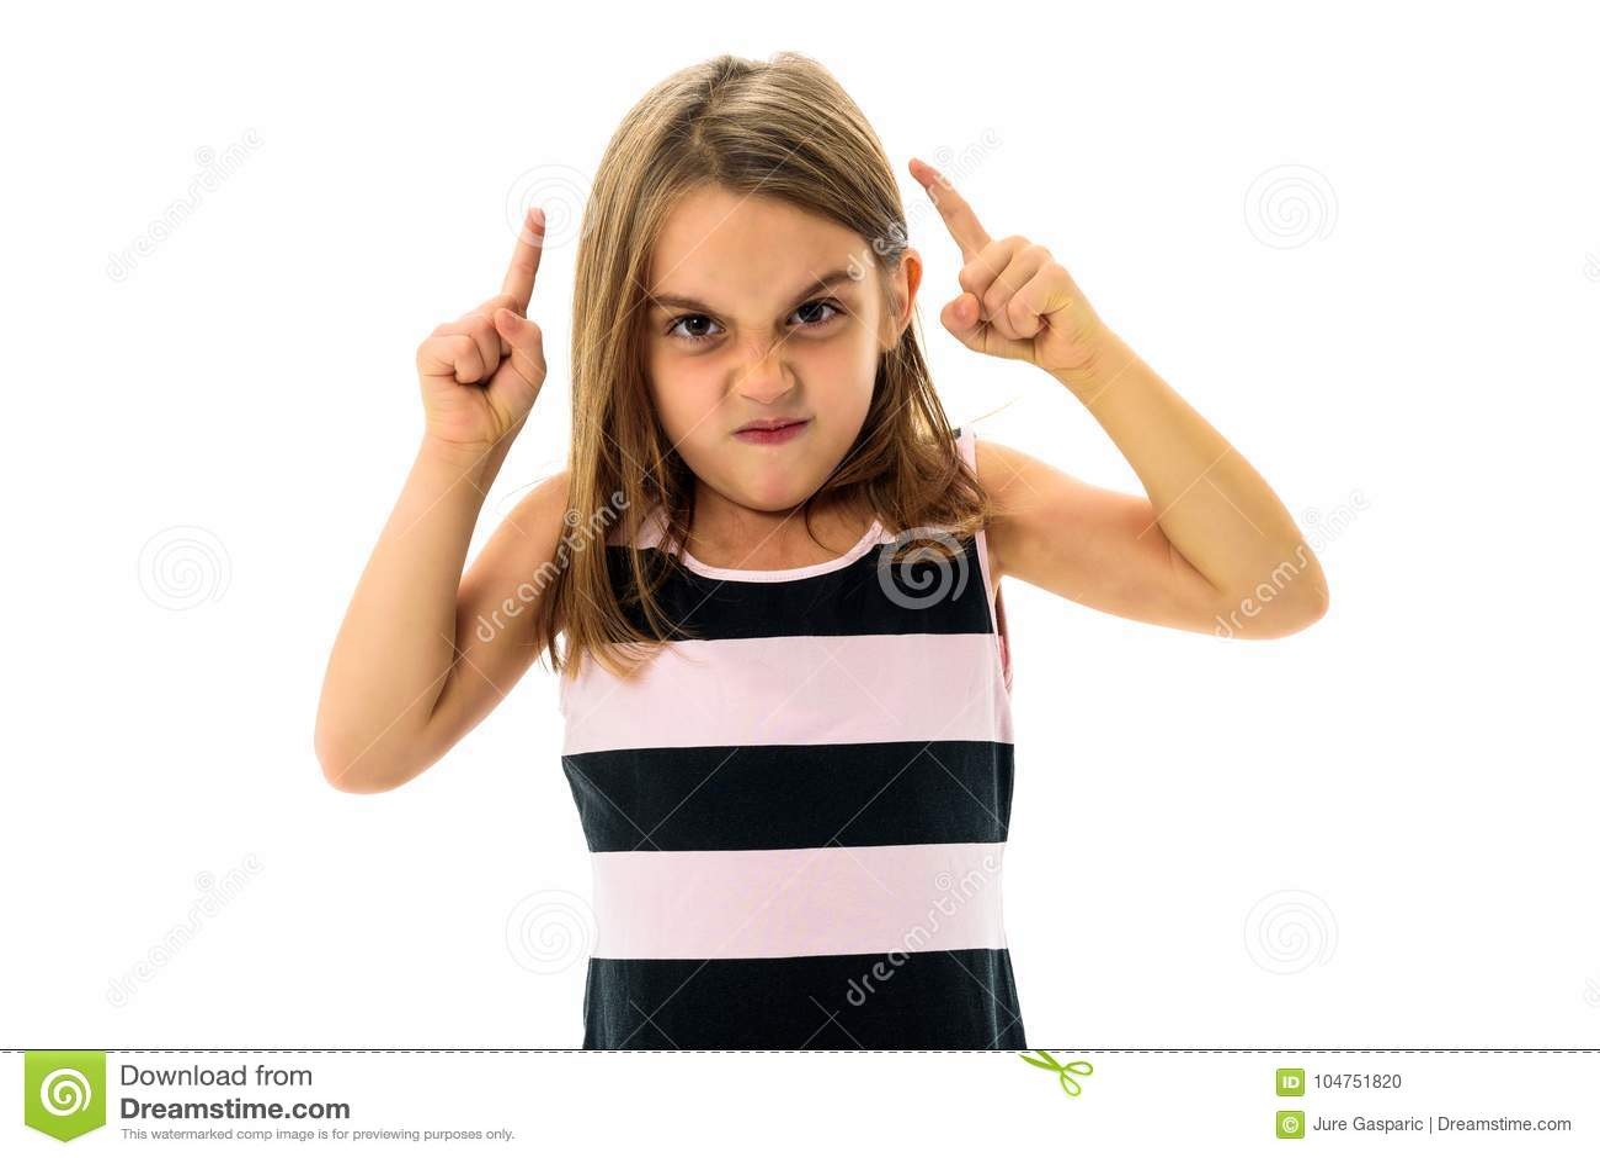 Weinig jong meisje is boos, gek, ongehoorzaam met slecht gedrag